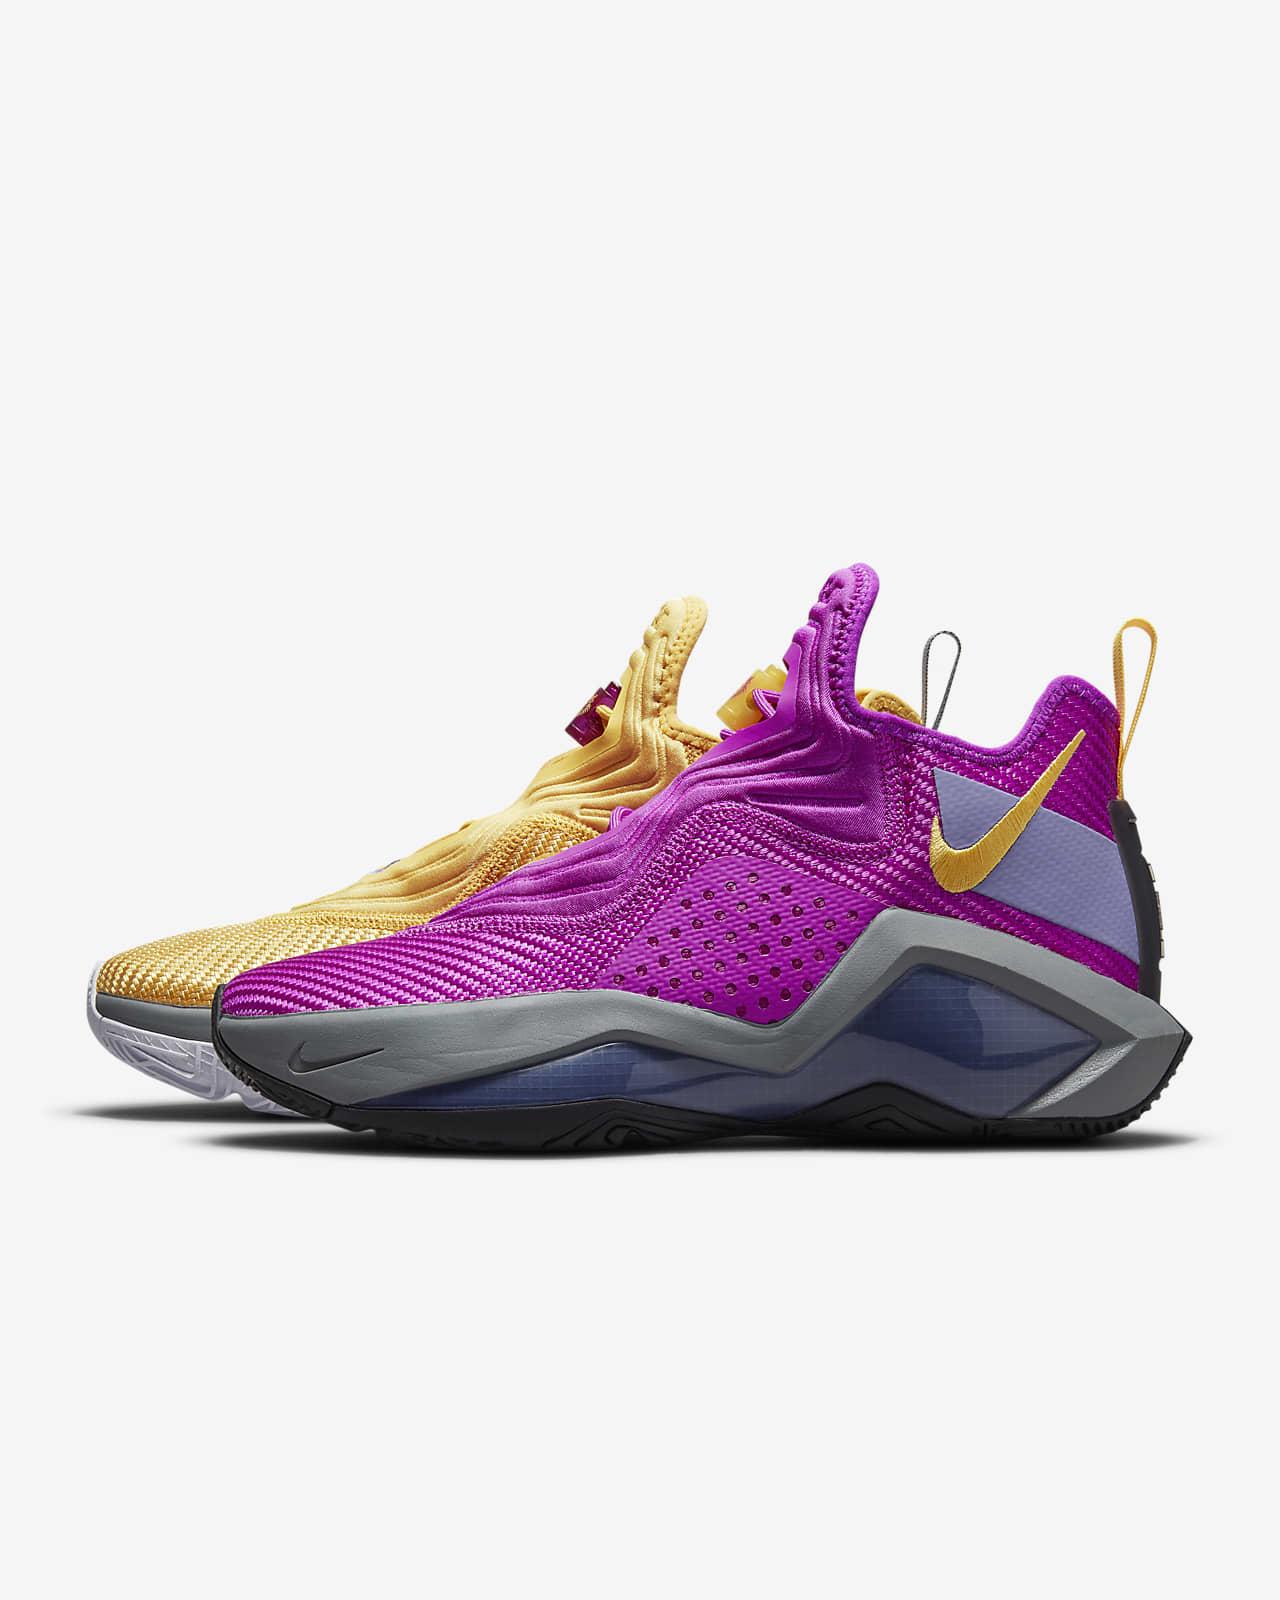 Nike LeBron Soldier 14 'Vivid Purple / Solar Flare' 9.97 Free Shipping